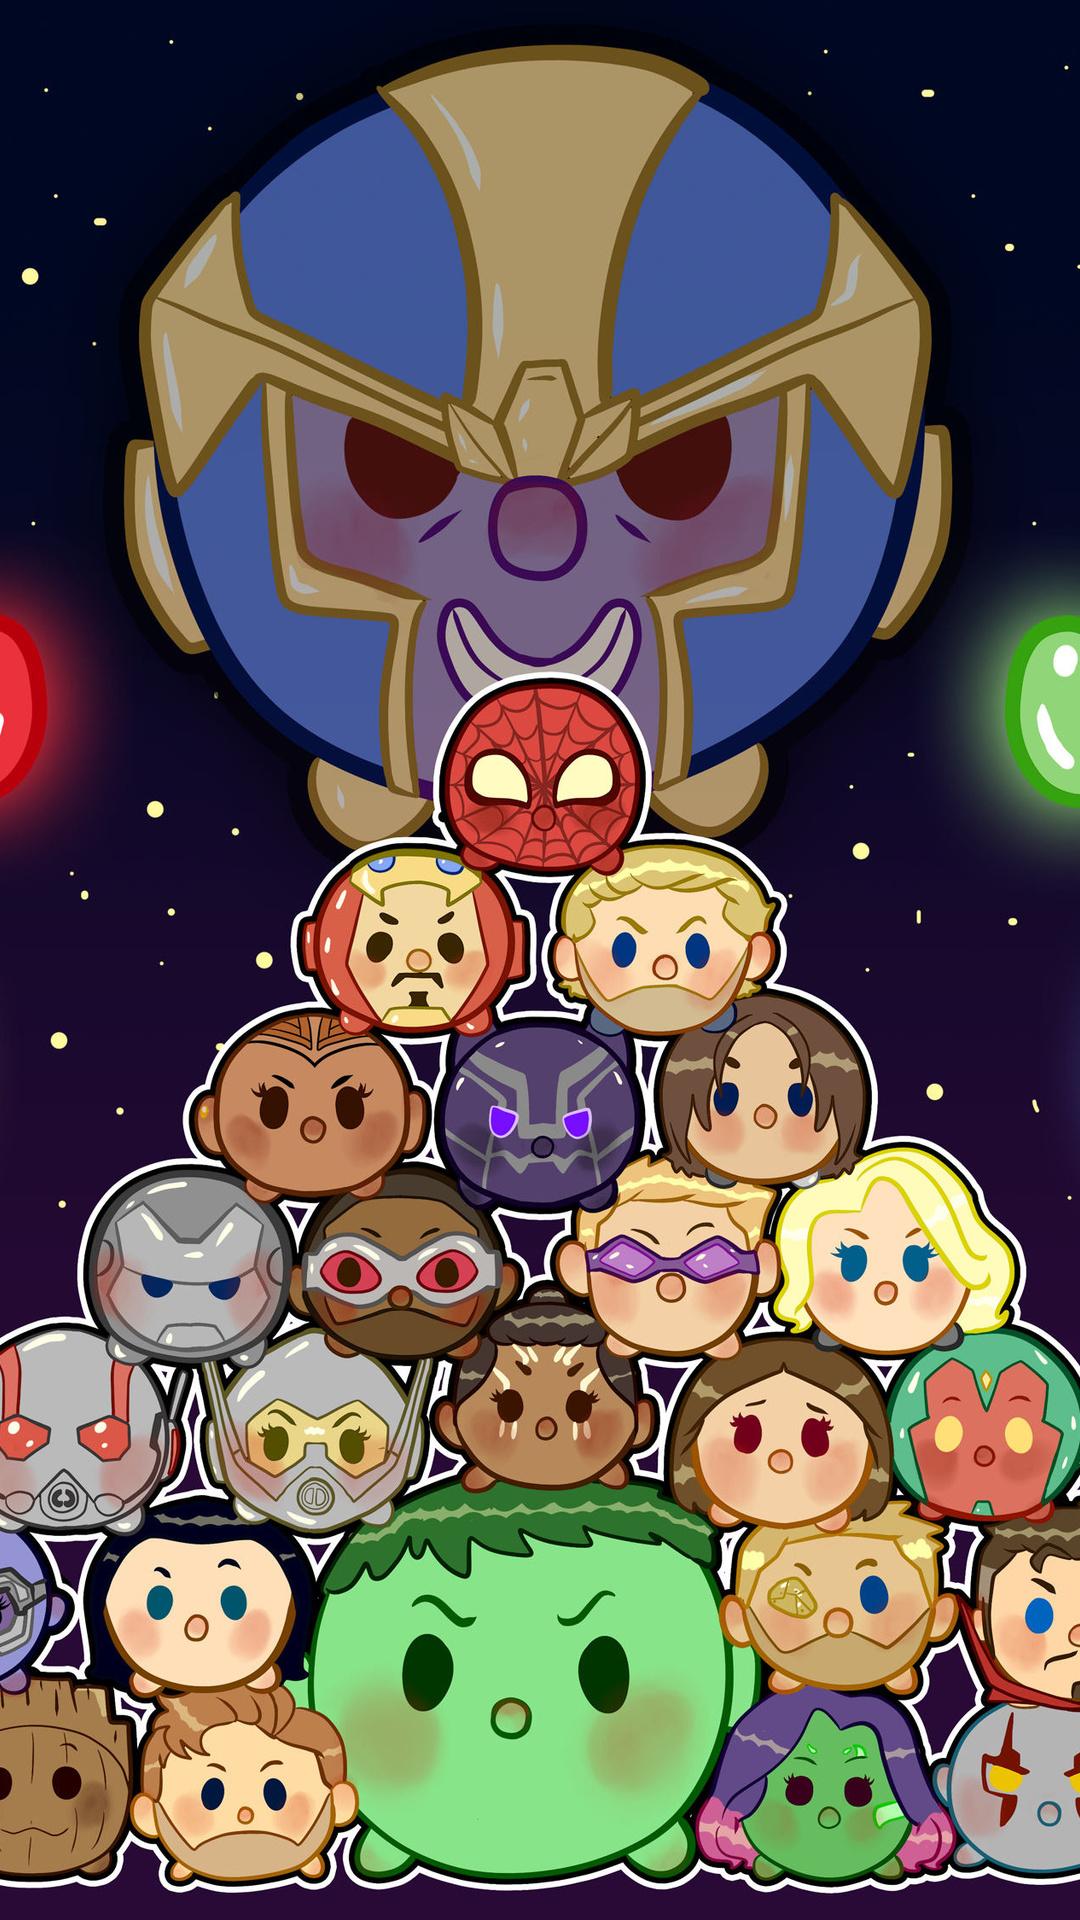 avengers-infinity-war-tsum-artwork-5m.jpg